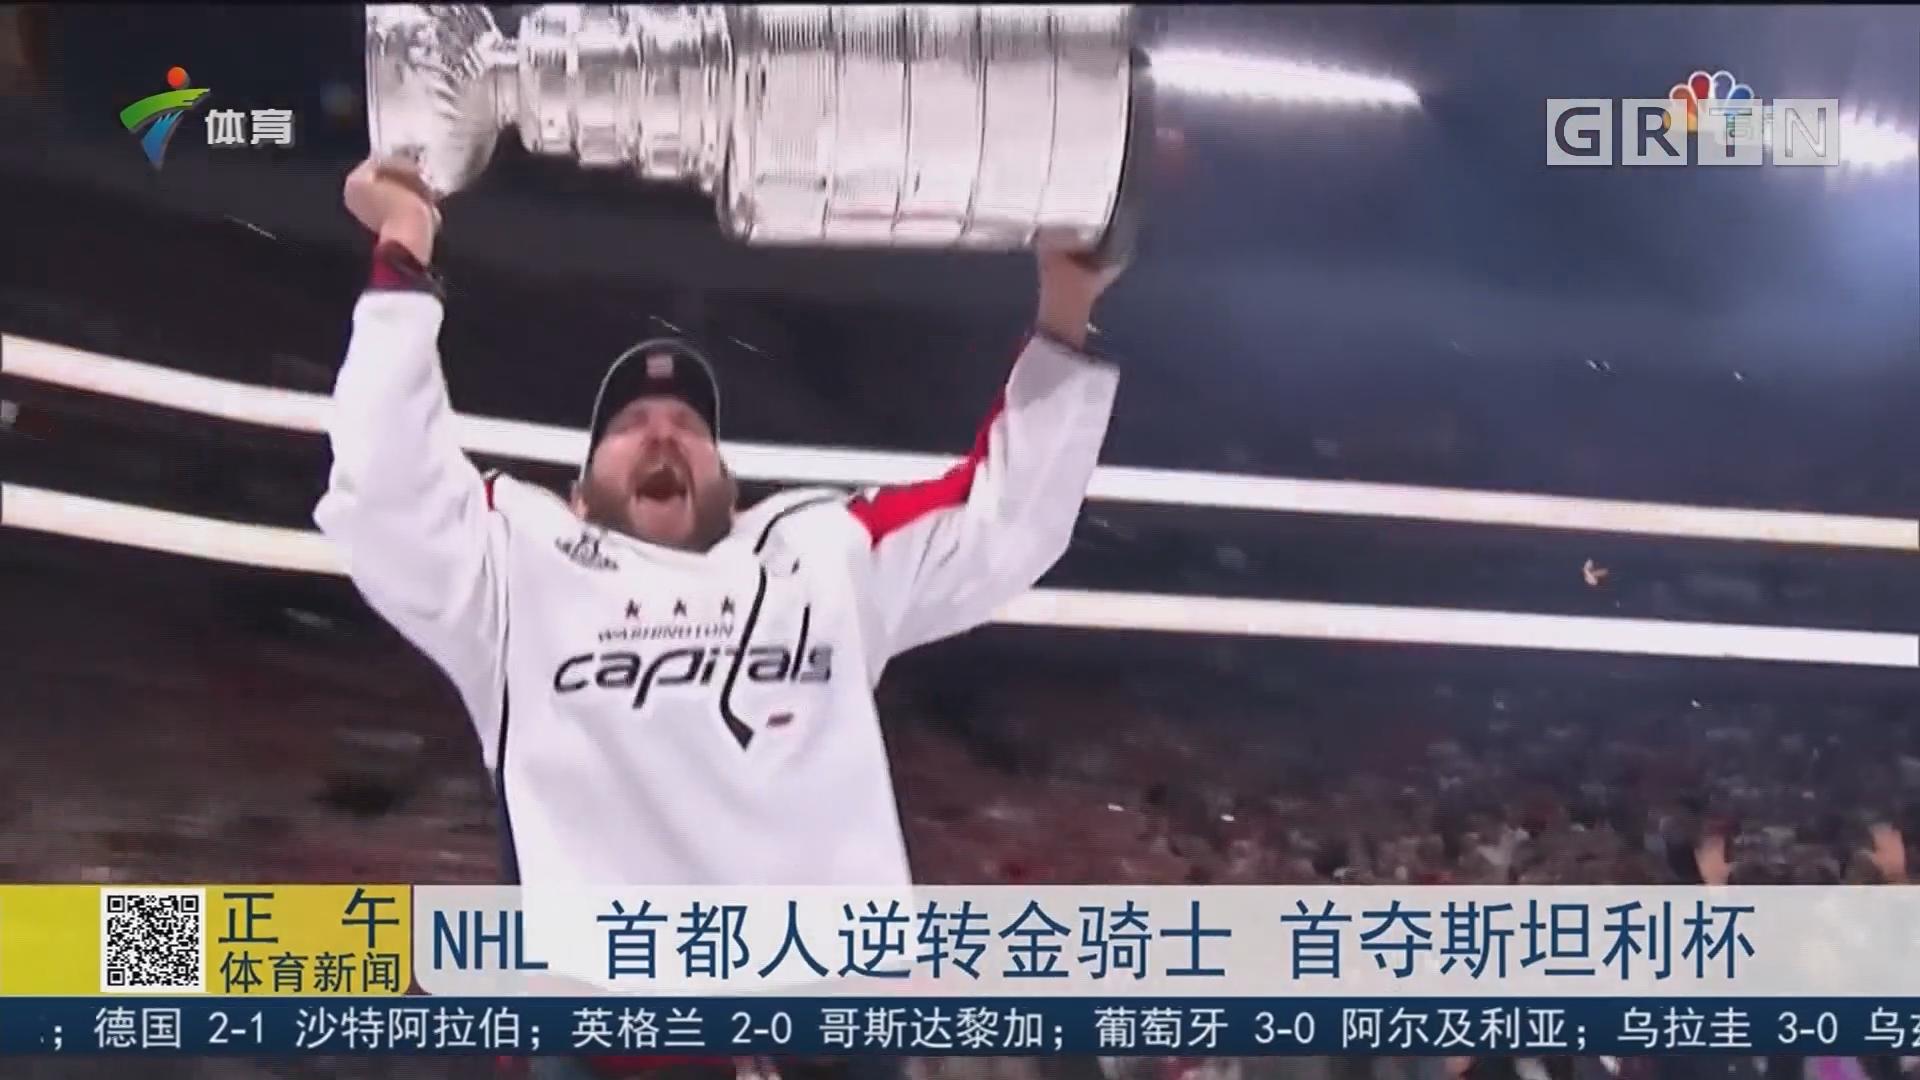 NHL 首都人逆转金骑士 首夺斯坦利杯